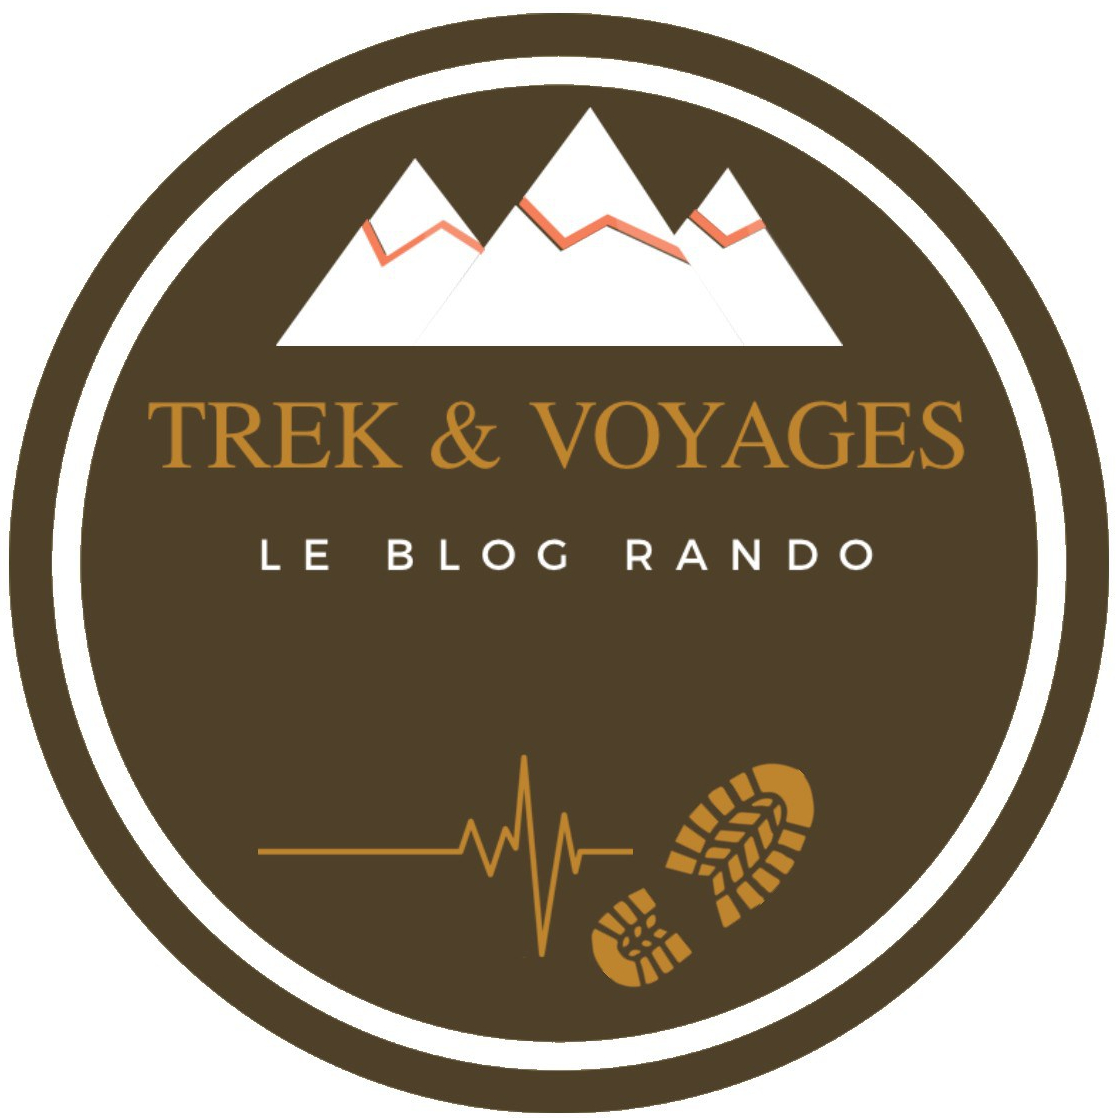 Trek & Voyages